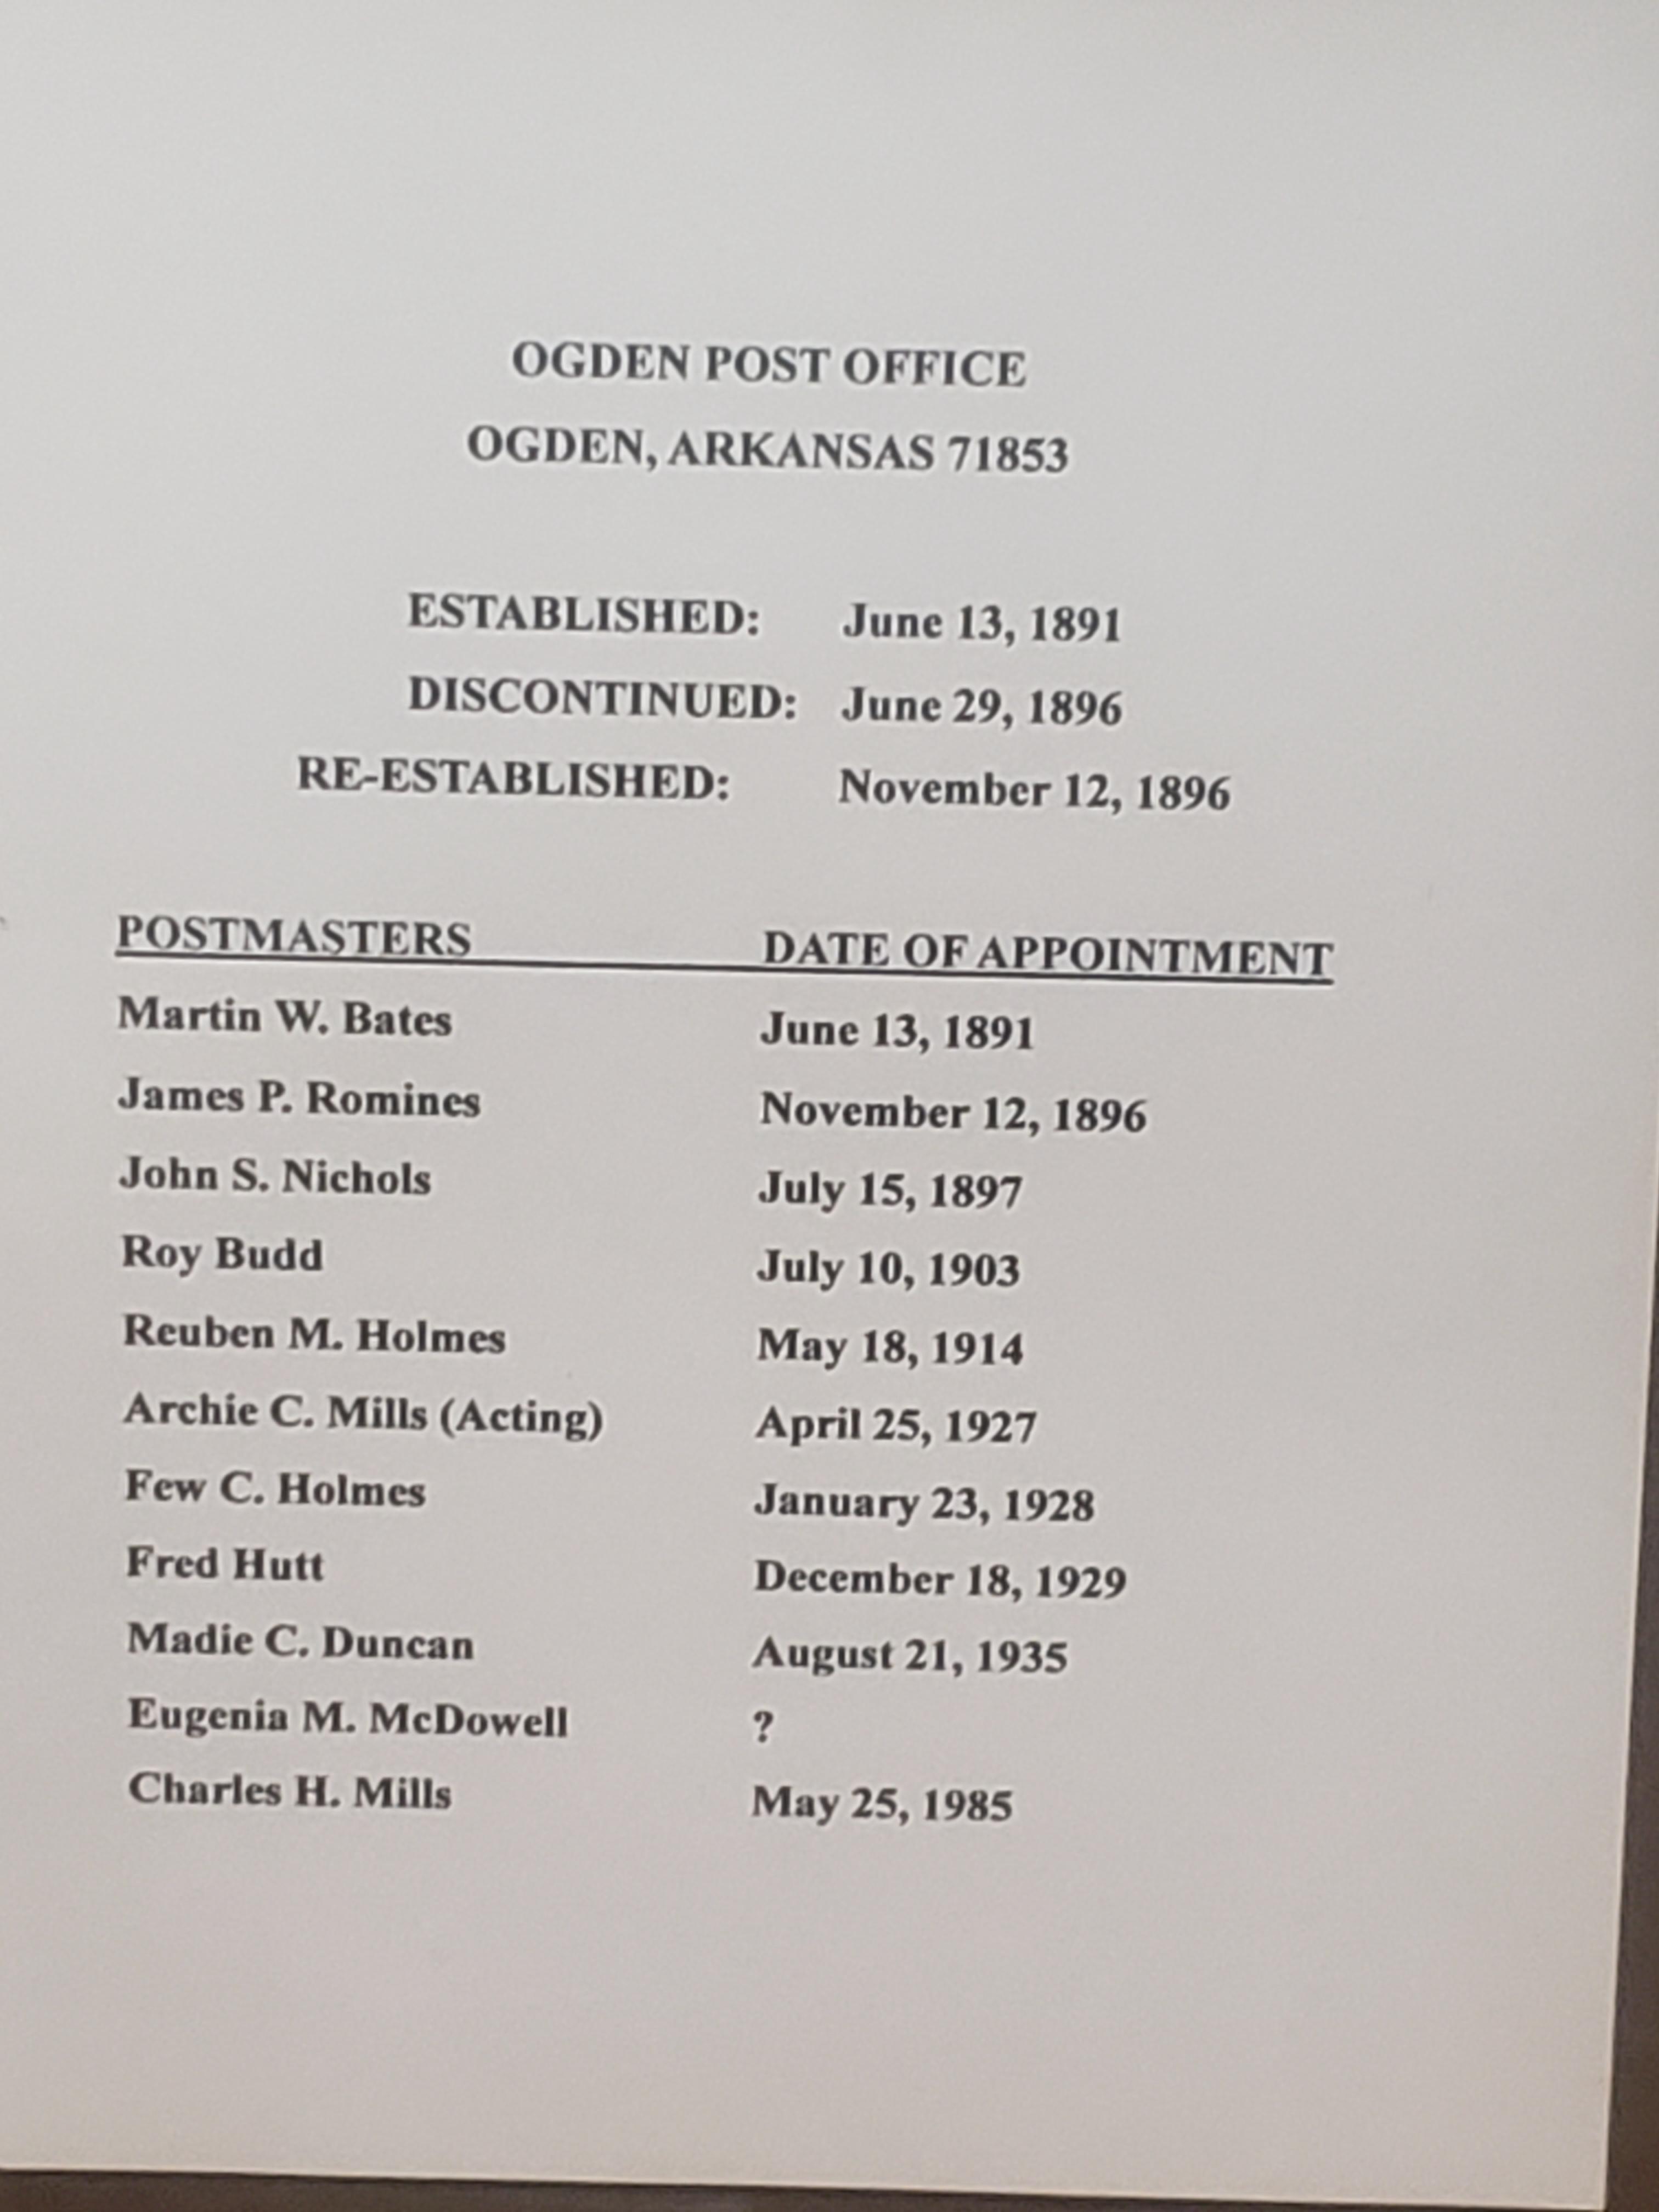 Ogden Post Office